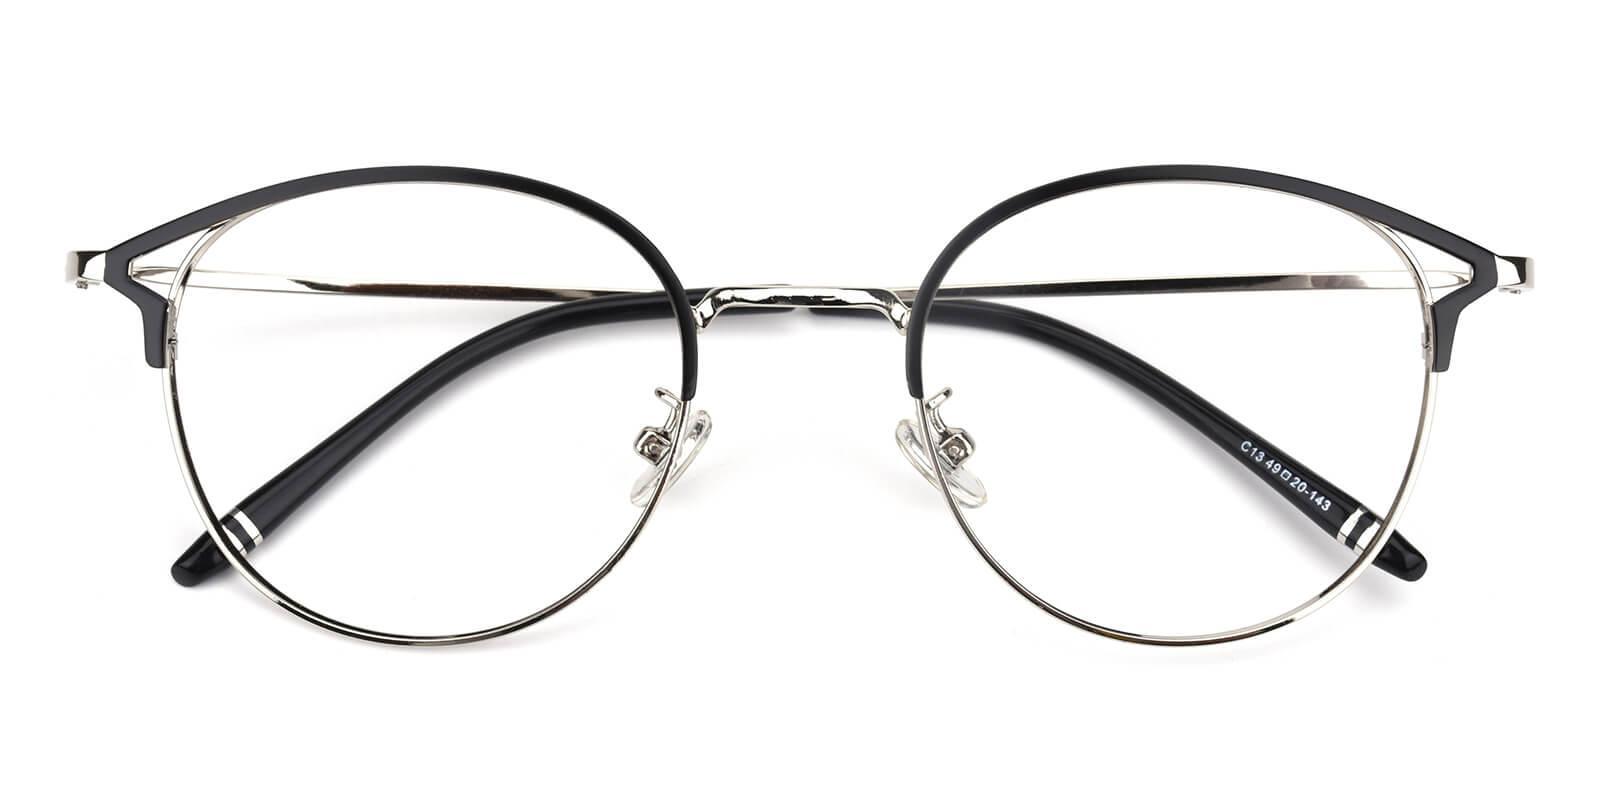 Brace-Silver-Browline-Metal-Eyeglasses-detail